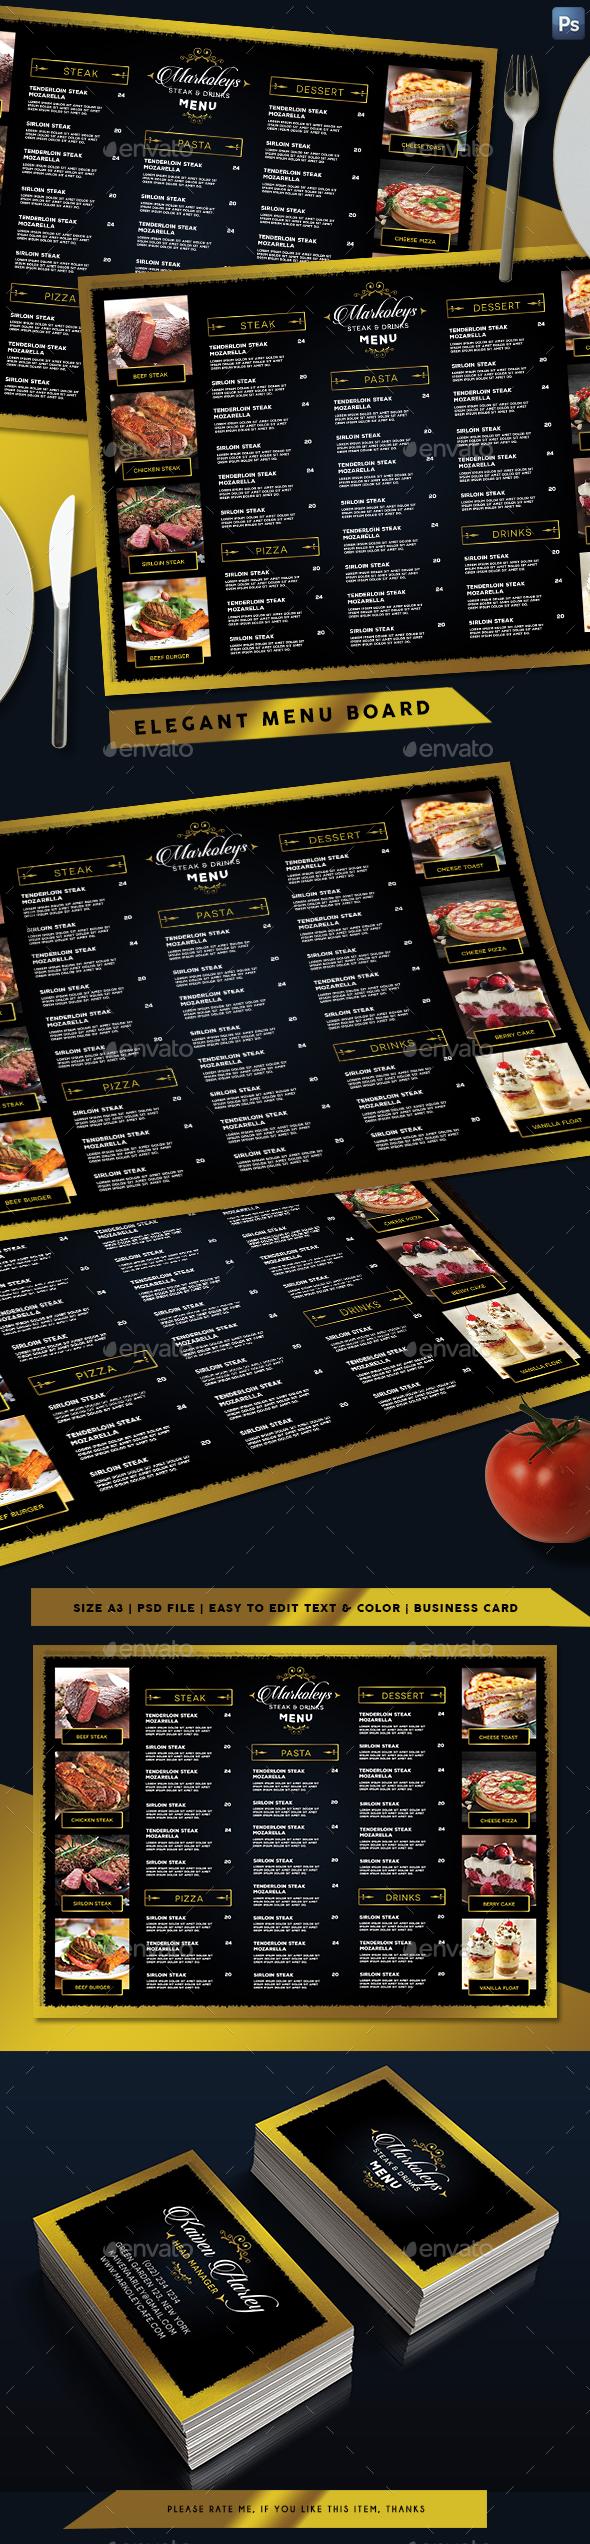 GraphicRiver Elegant Restaurant Menu Board & Business Card 20540624